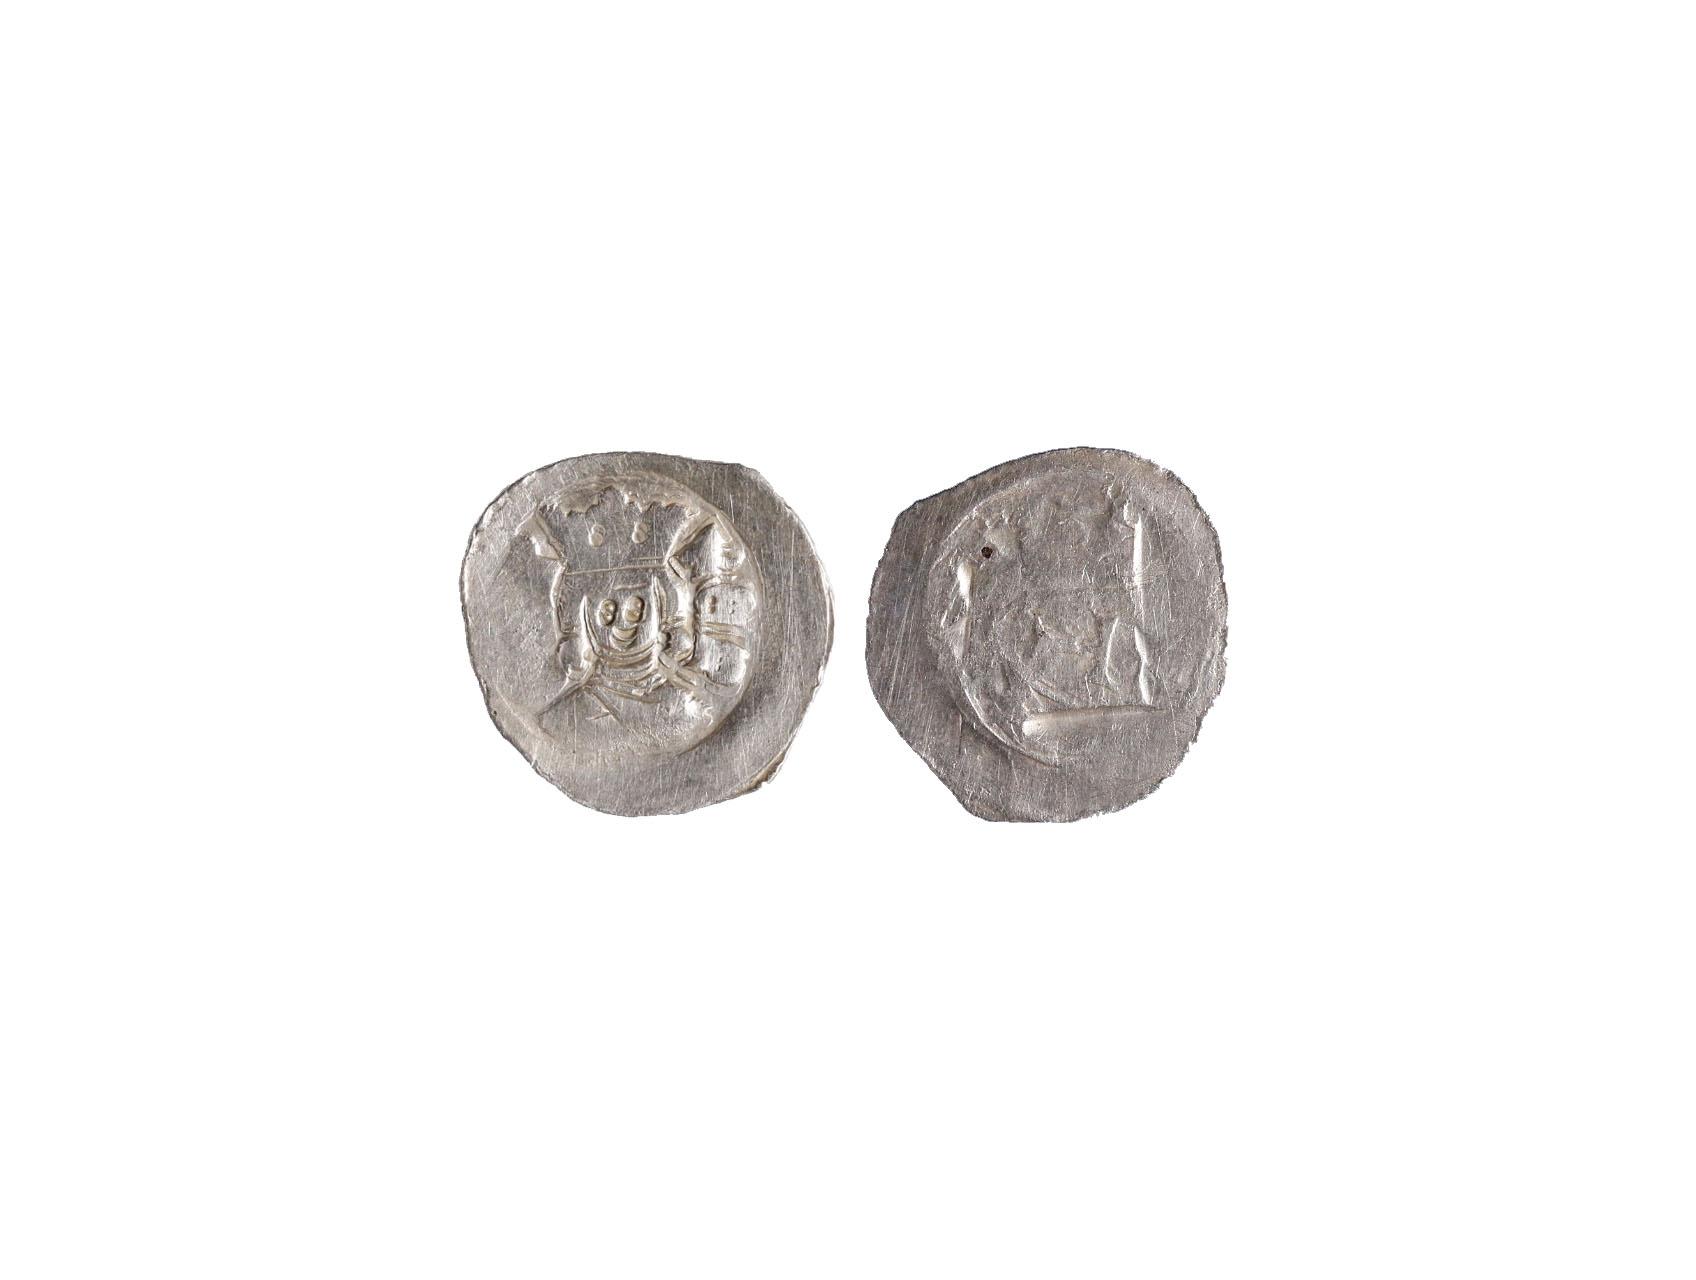 Přemysl Otakar II. 1253-1278 - Fenik, Vídeň, korunované poprsí, opis OTA-KER, rv: erb Konráda z Tullnu, text ned.